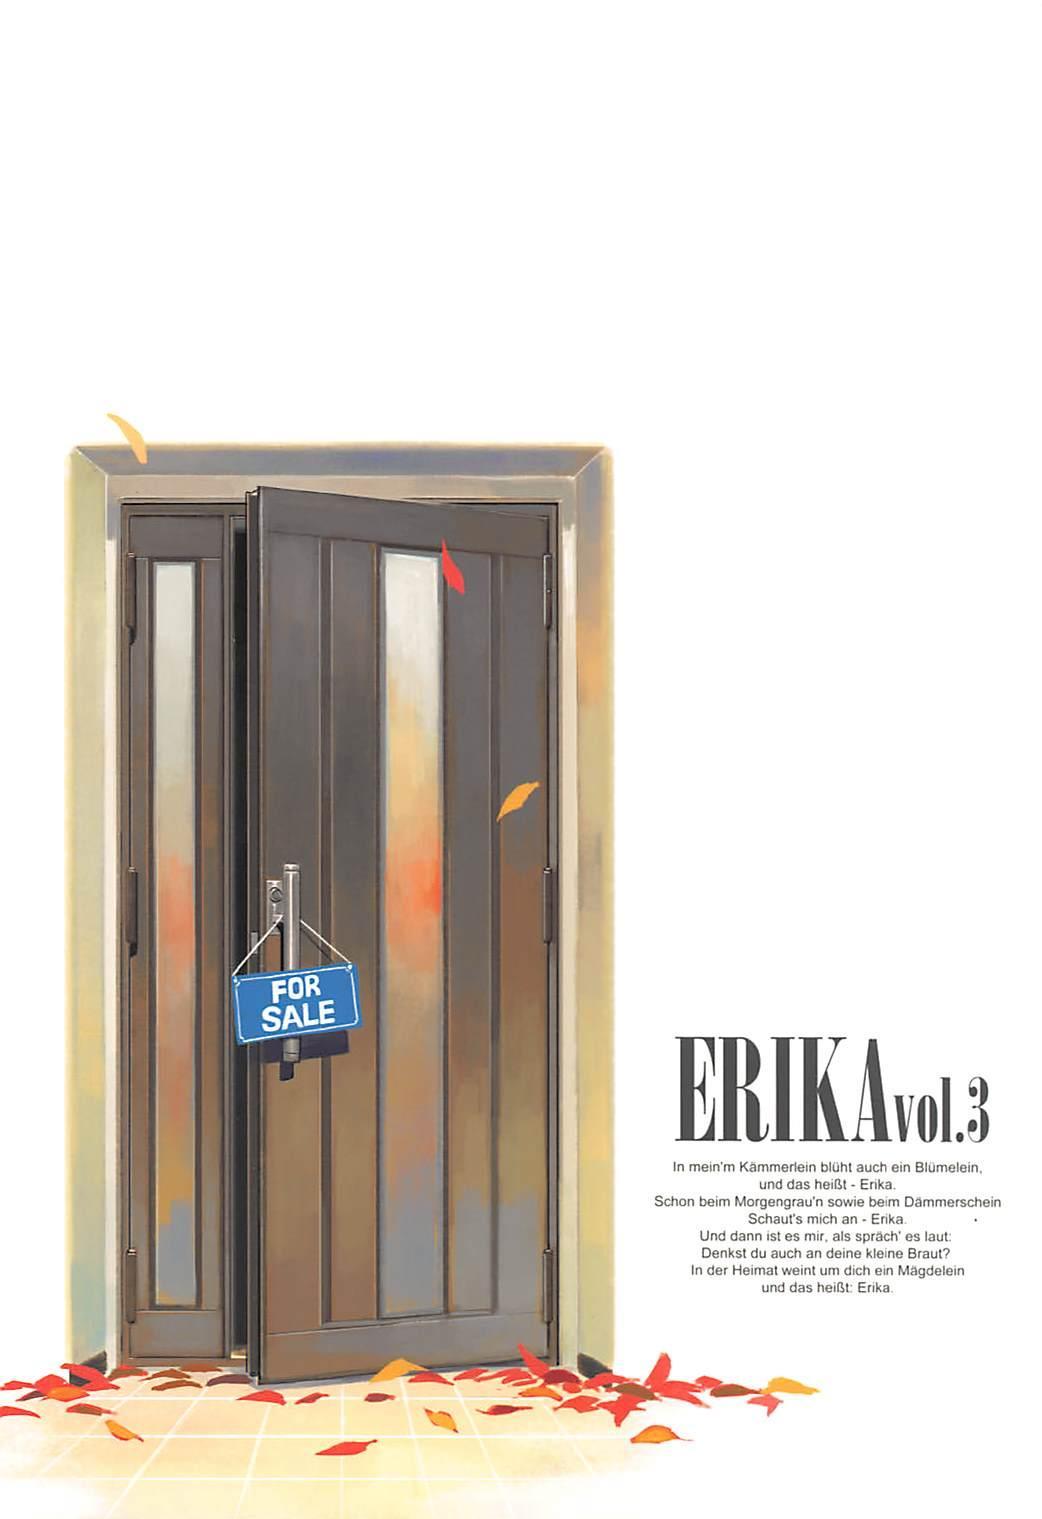 ERIKA Vol. 3 63